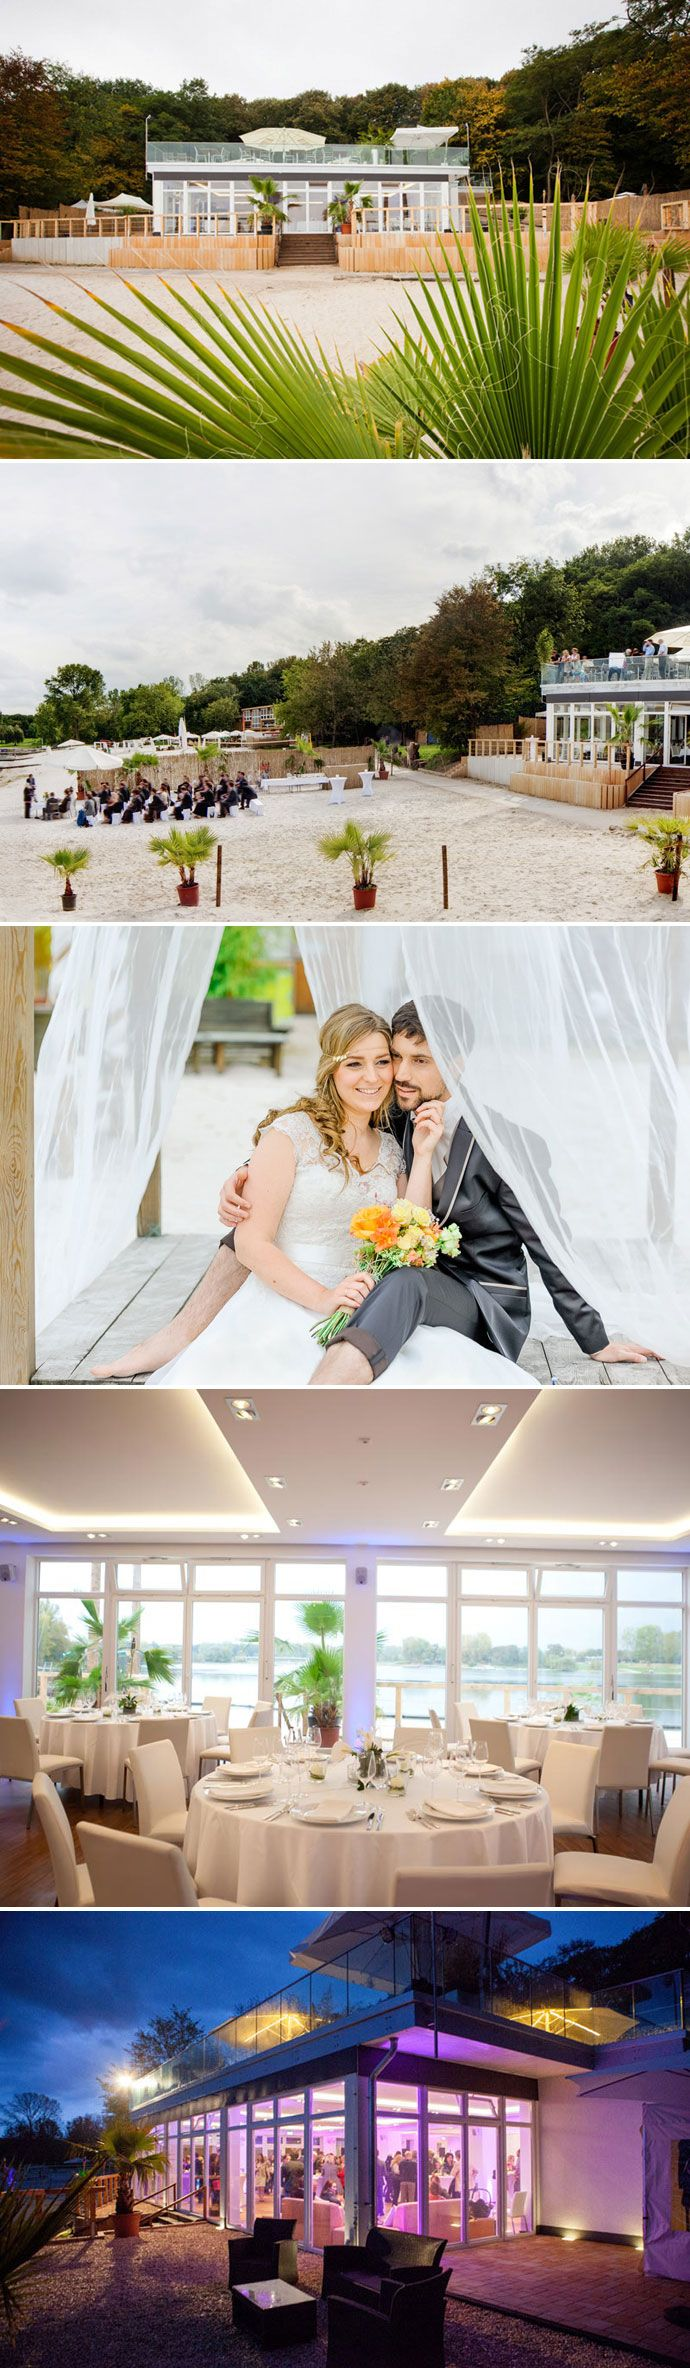 Hochzeitslocation Köln Seepavillon Sonderkonditionen